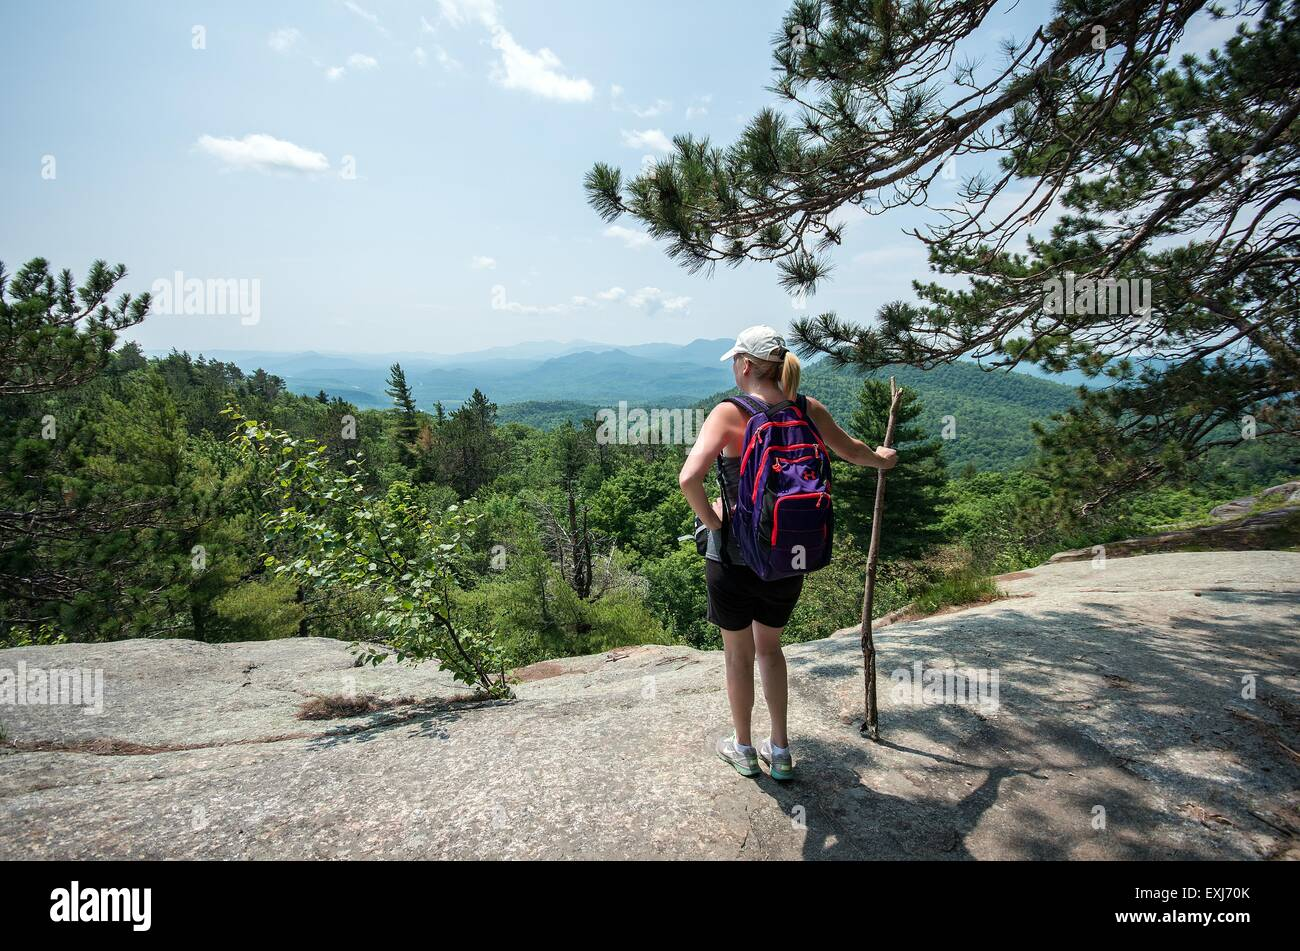 Hiking to the summit of Poke-O-Moonshine mountain - Stock Image